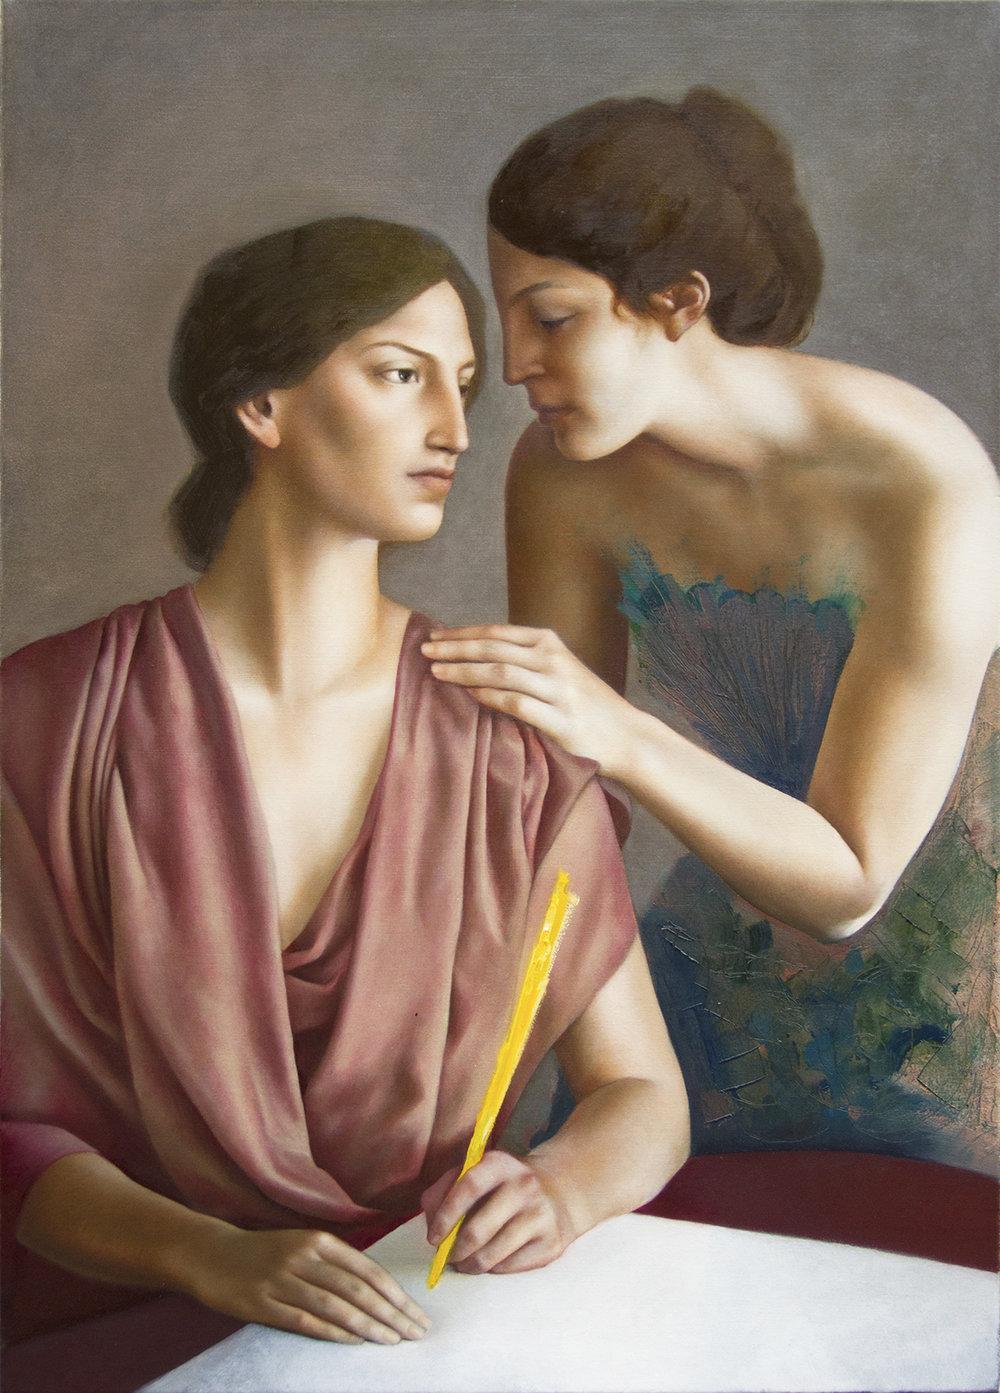 Caesura, oil on canvas, 96 x 70 cm, 2014